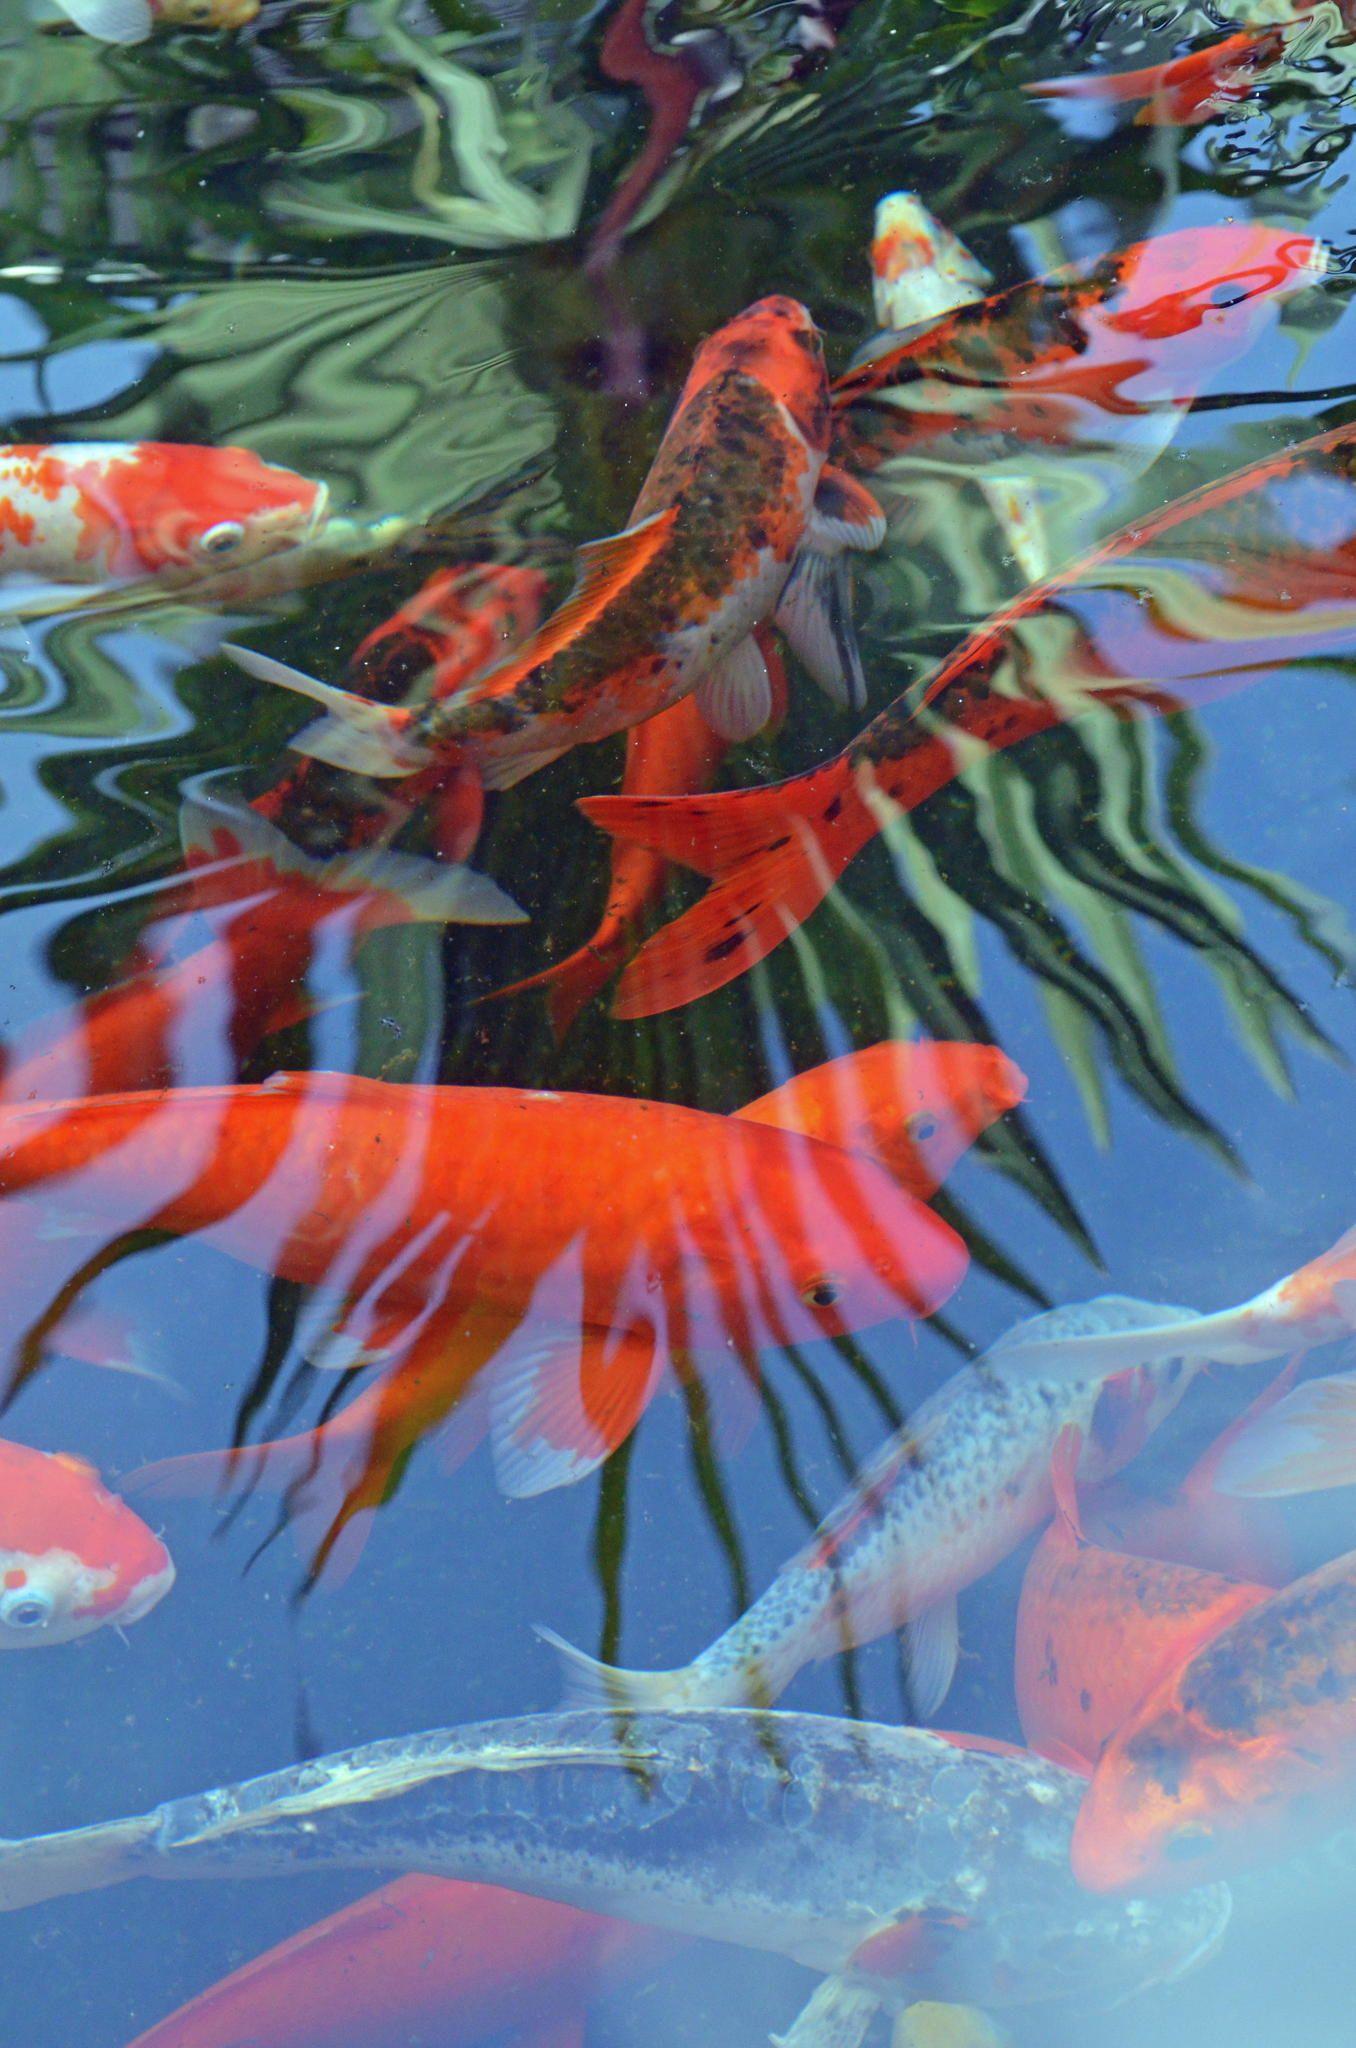 Pin by donna picard on koi koi koi fish pond common carp for Koi fish pond care